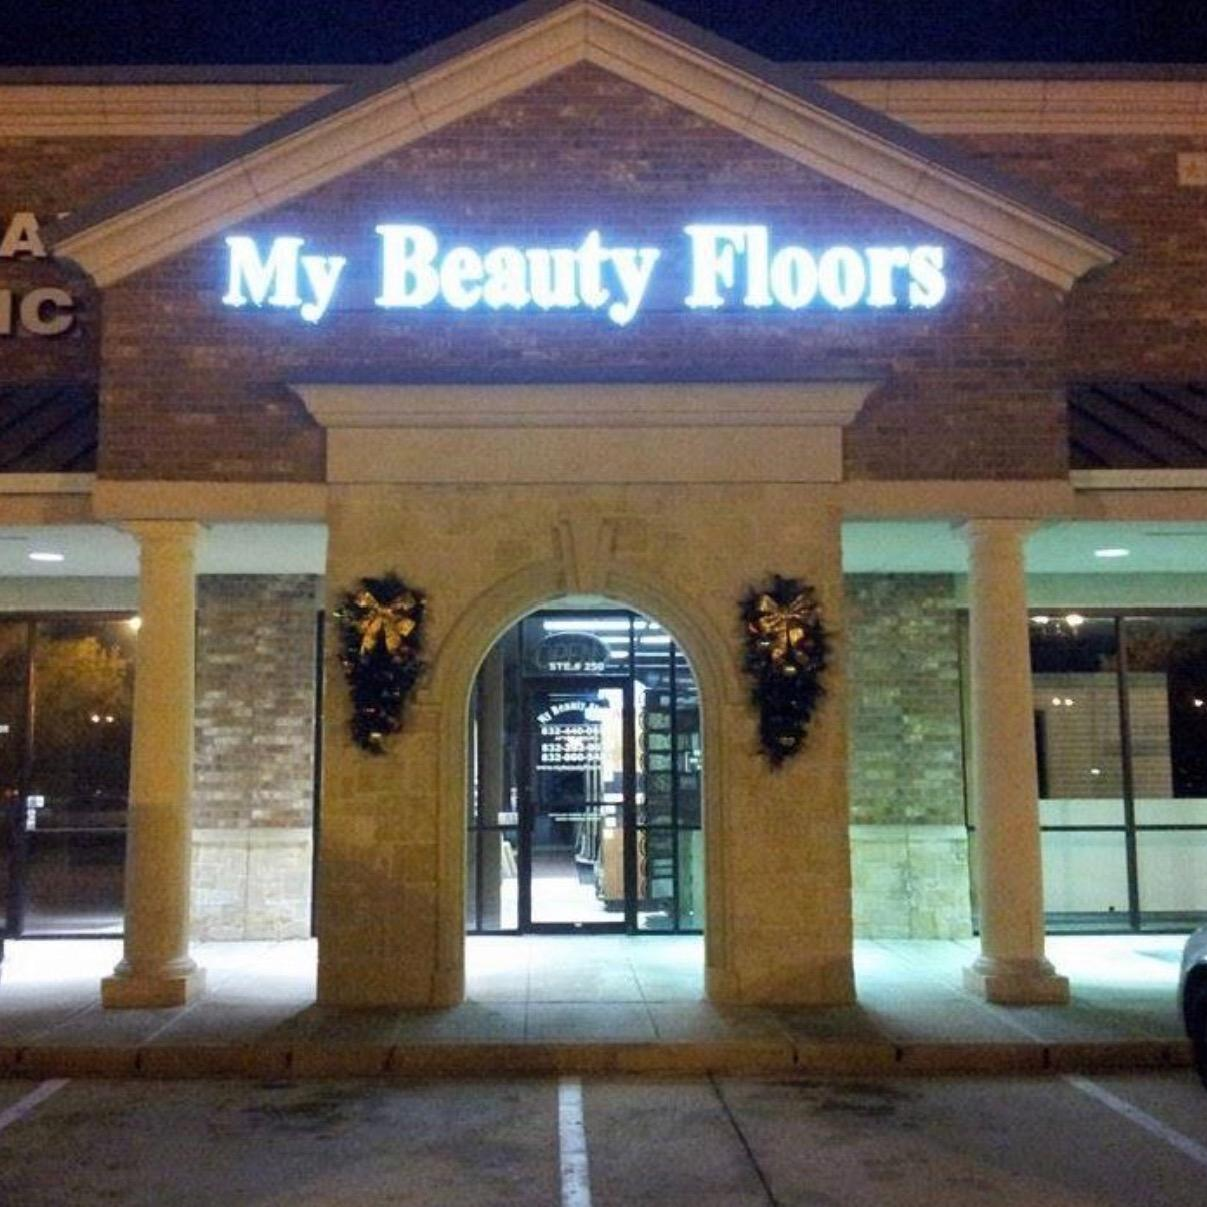 My beauty floors